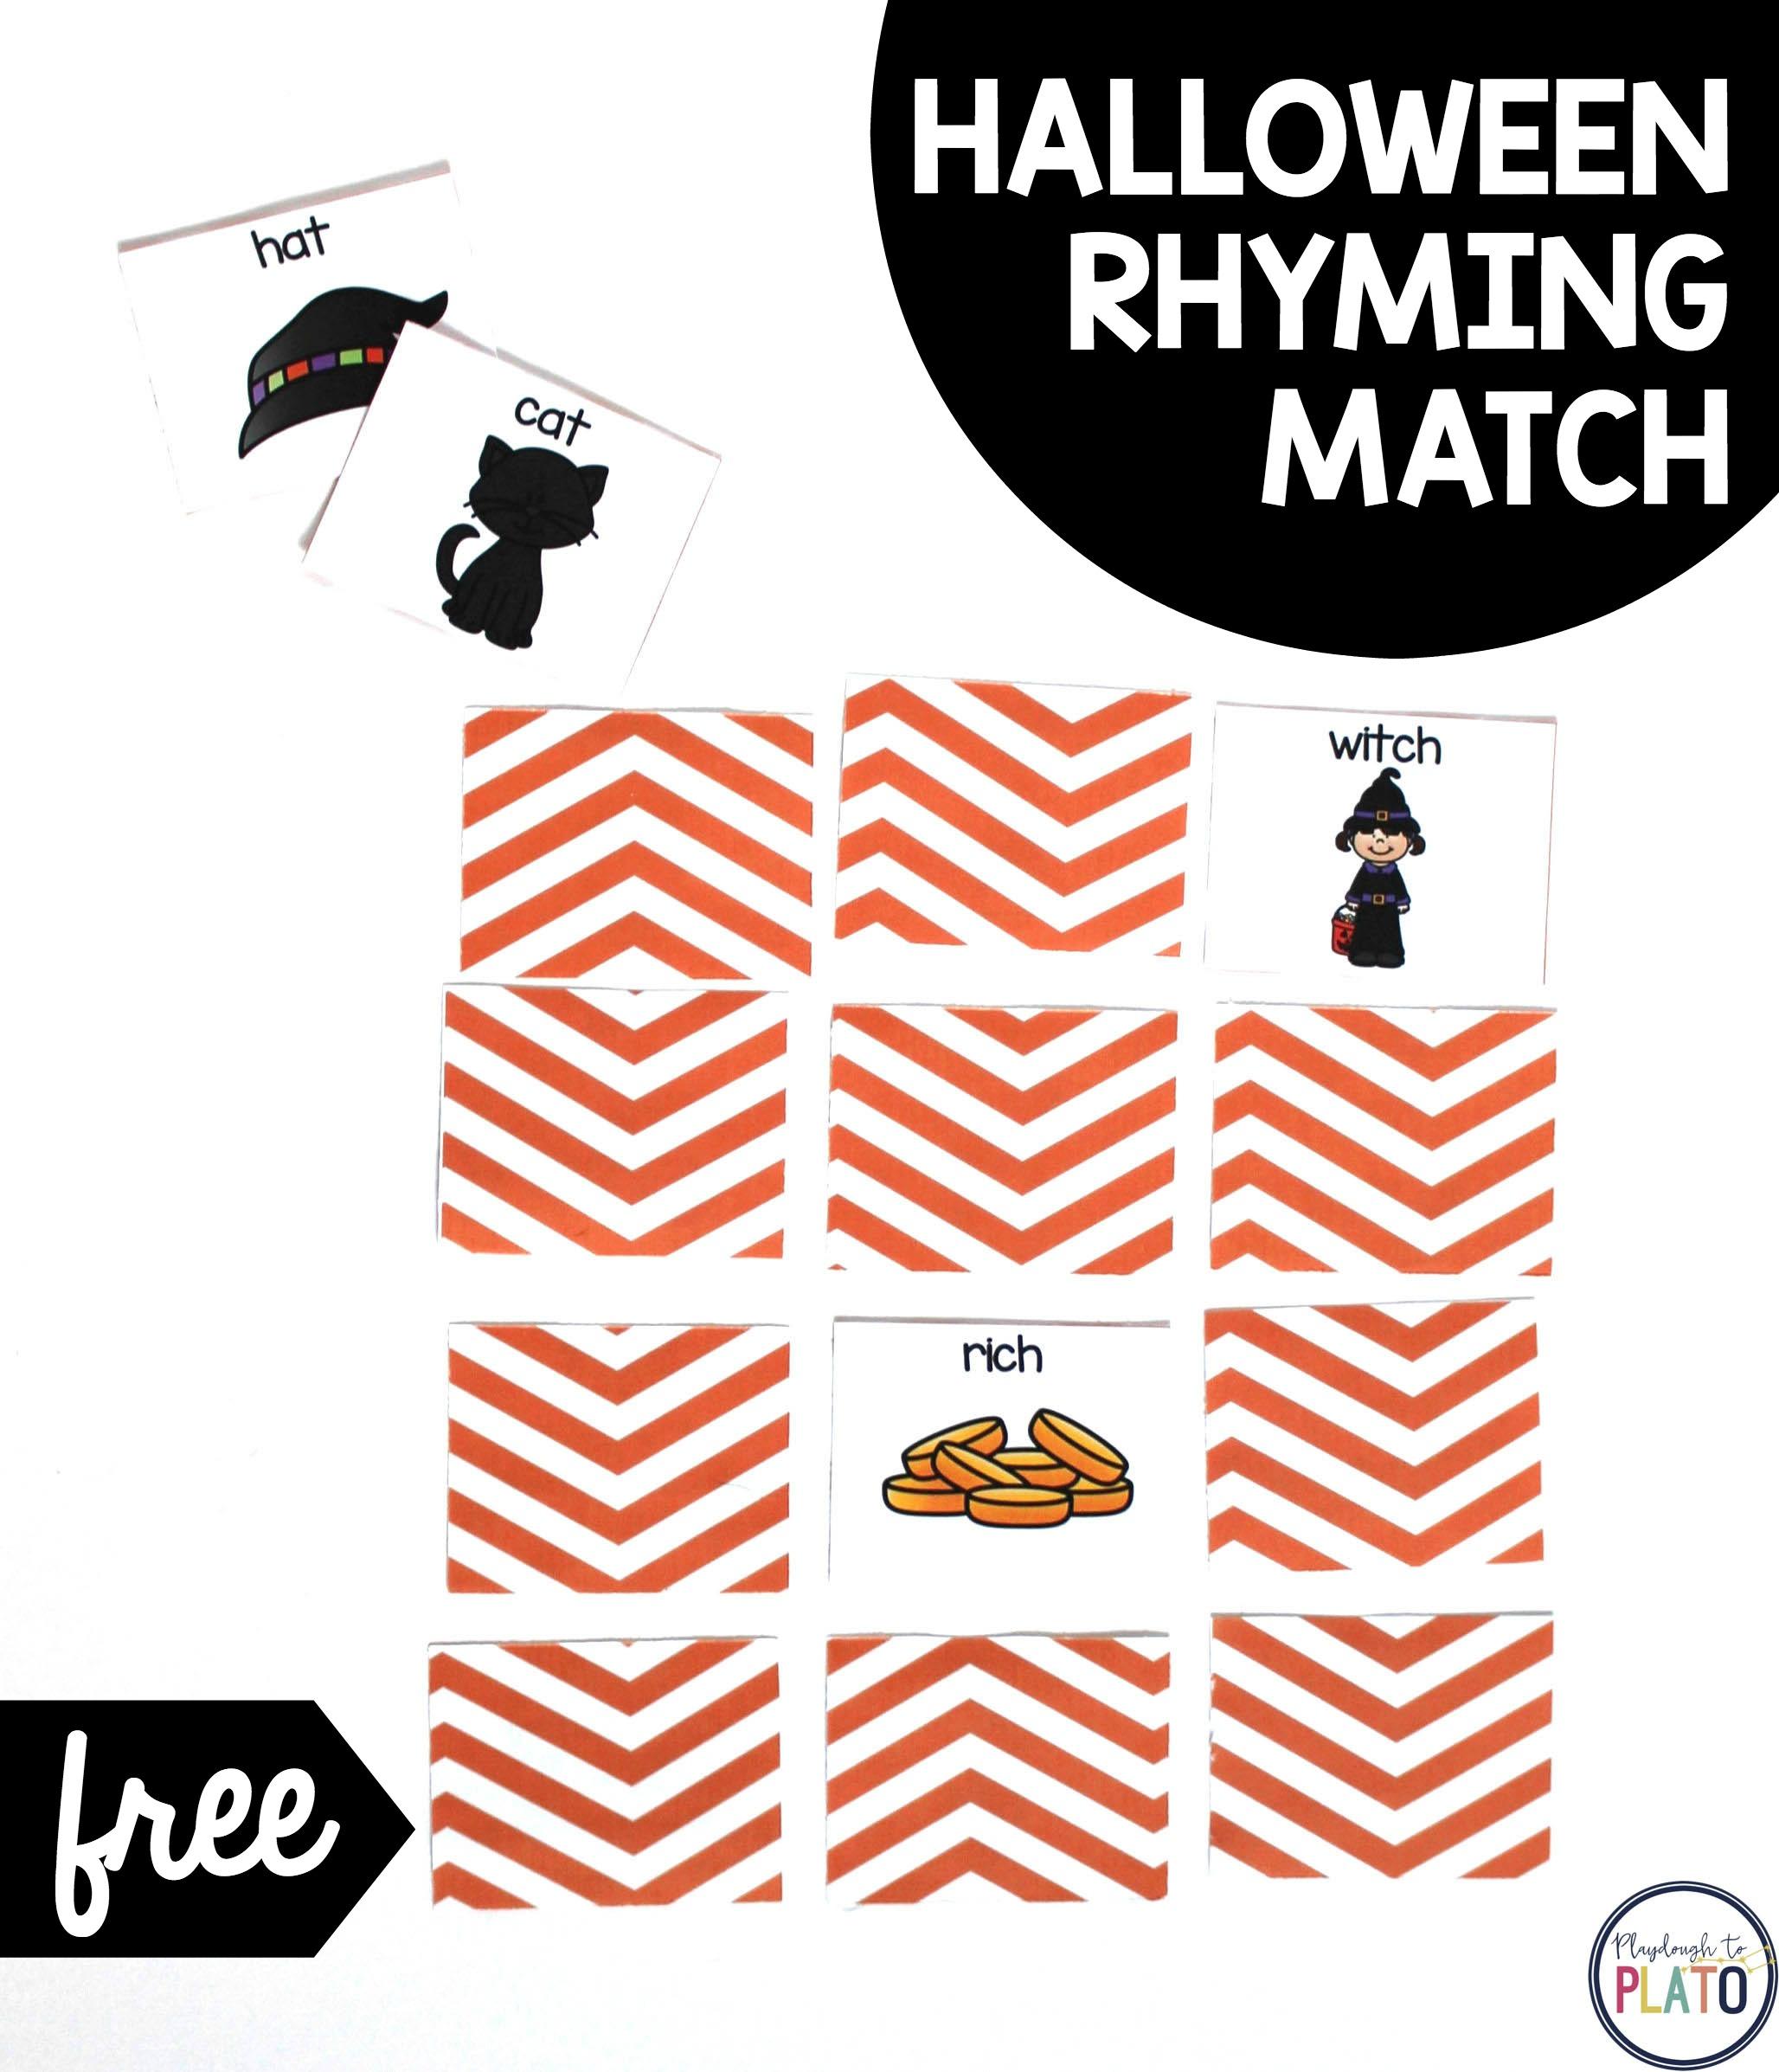 Halloween Rhyming Match Up!